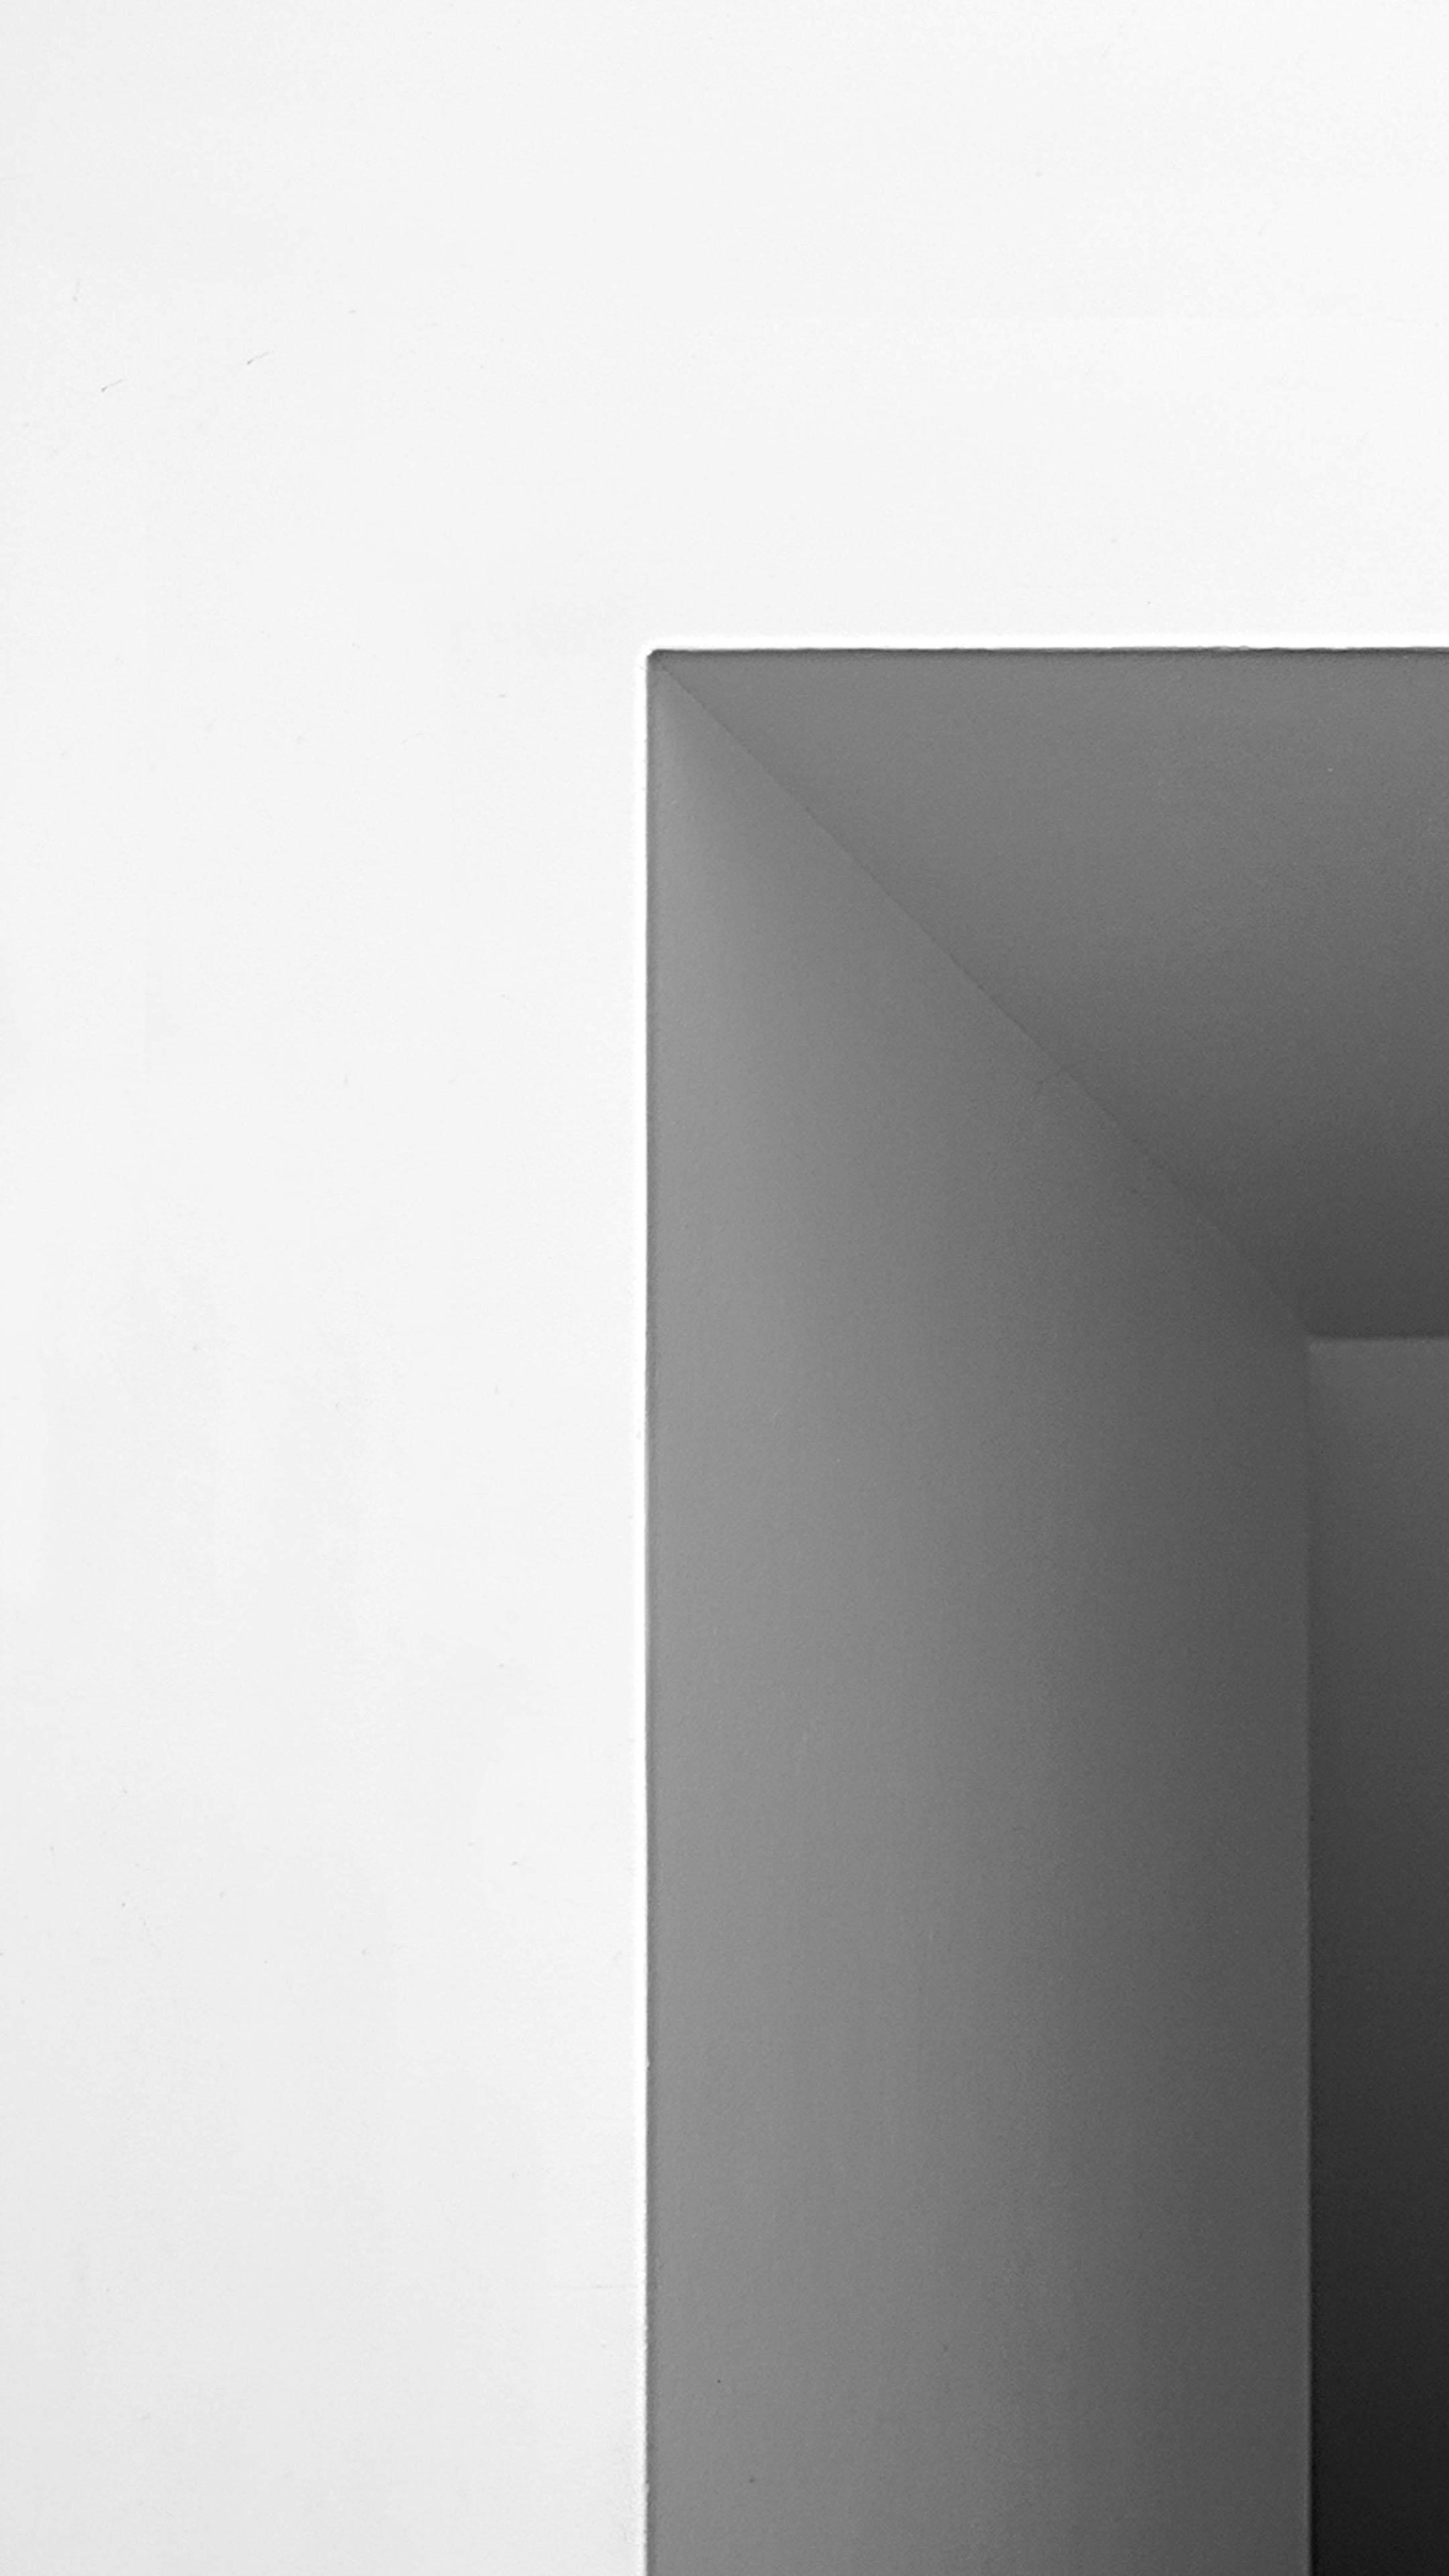 Blank Angle Mobile Wallpaper Miniwallist